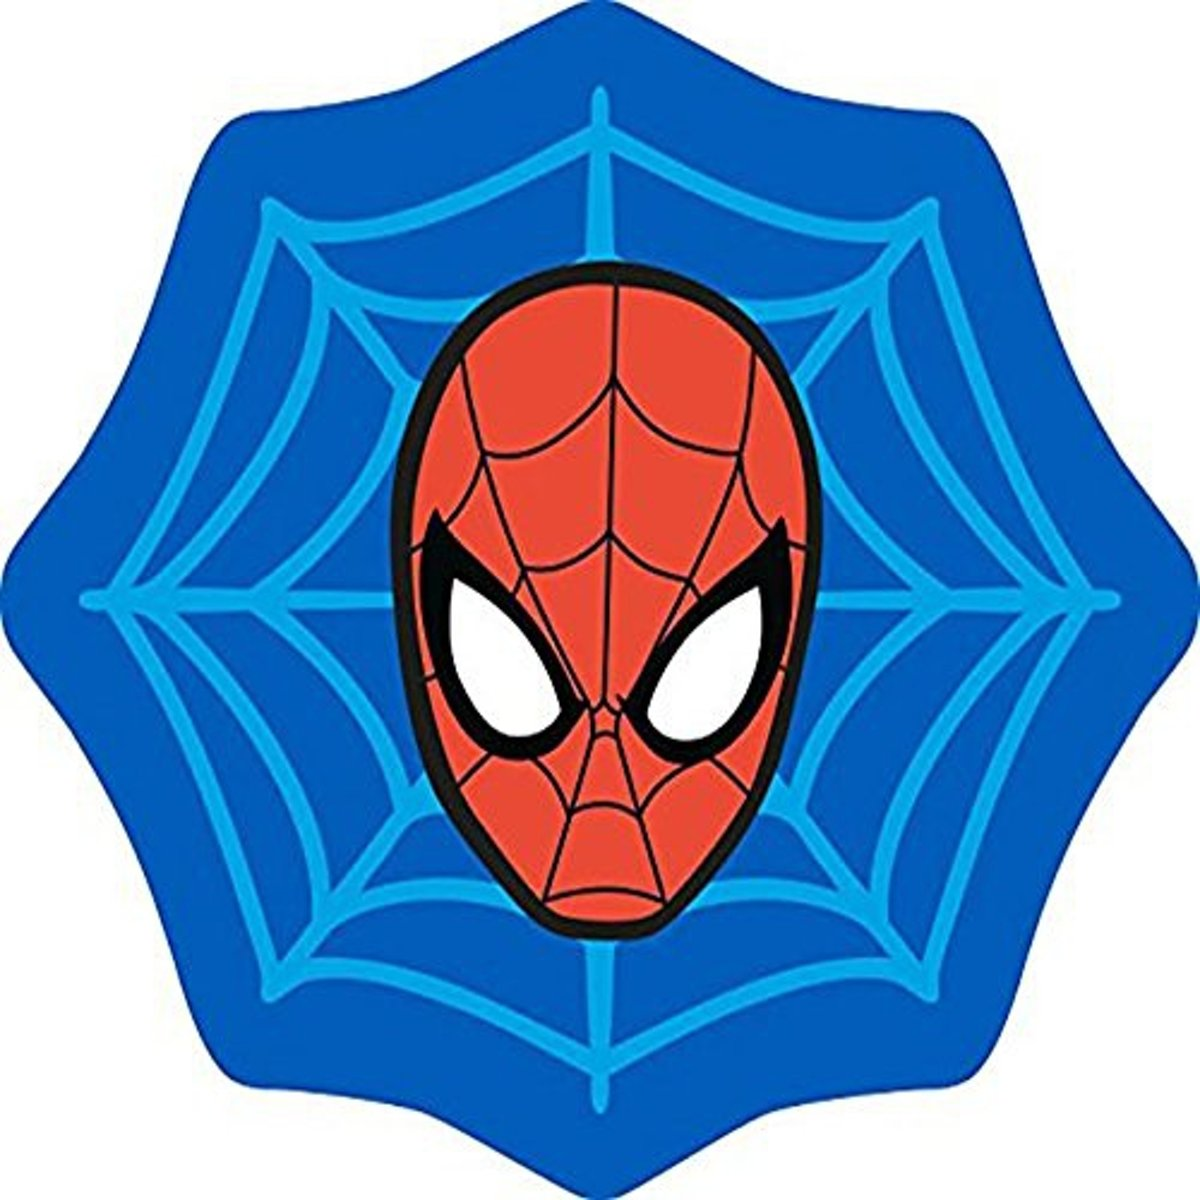 Spider-Man Abstract - Vloerkleed - 80 x 80 cm - Blauw